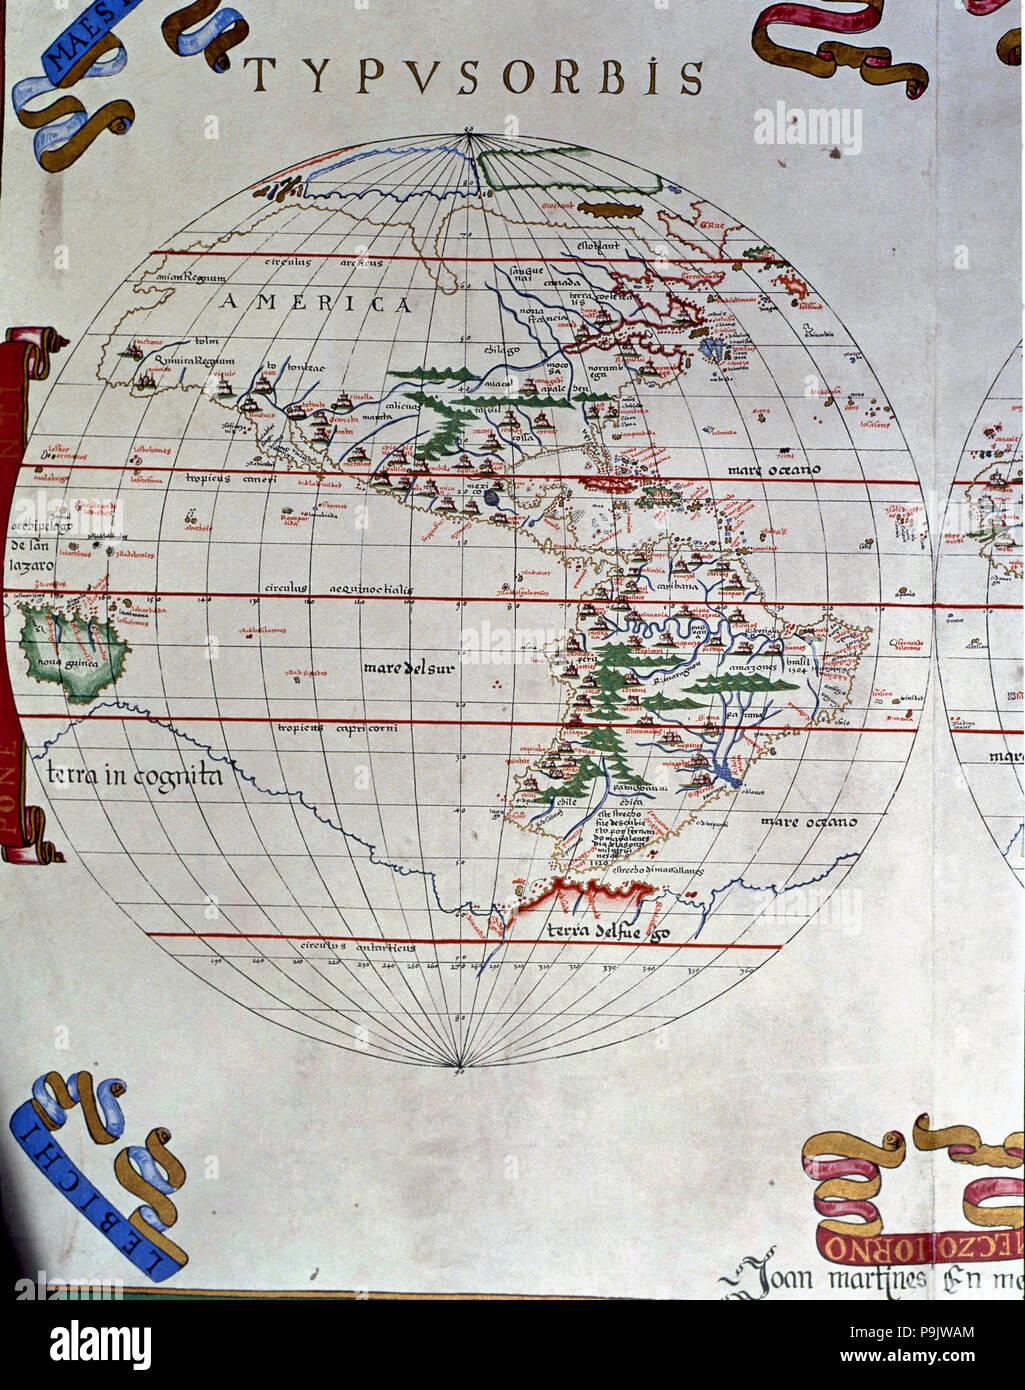 Atlas of Joan Martines, Messina, 1582. Portulan chart of the Americas. Stock Photo